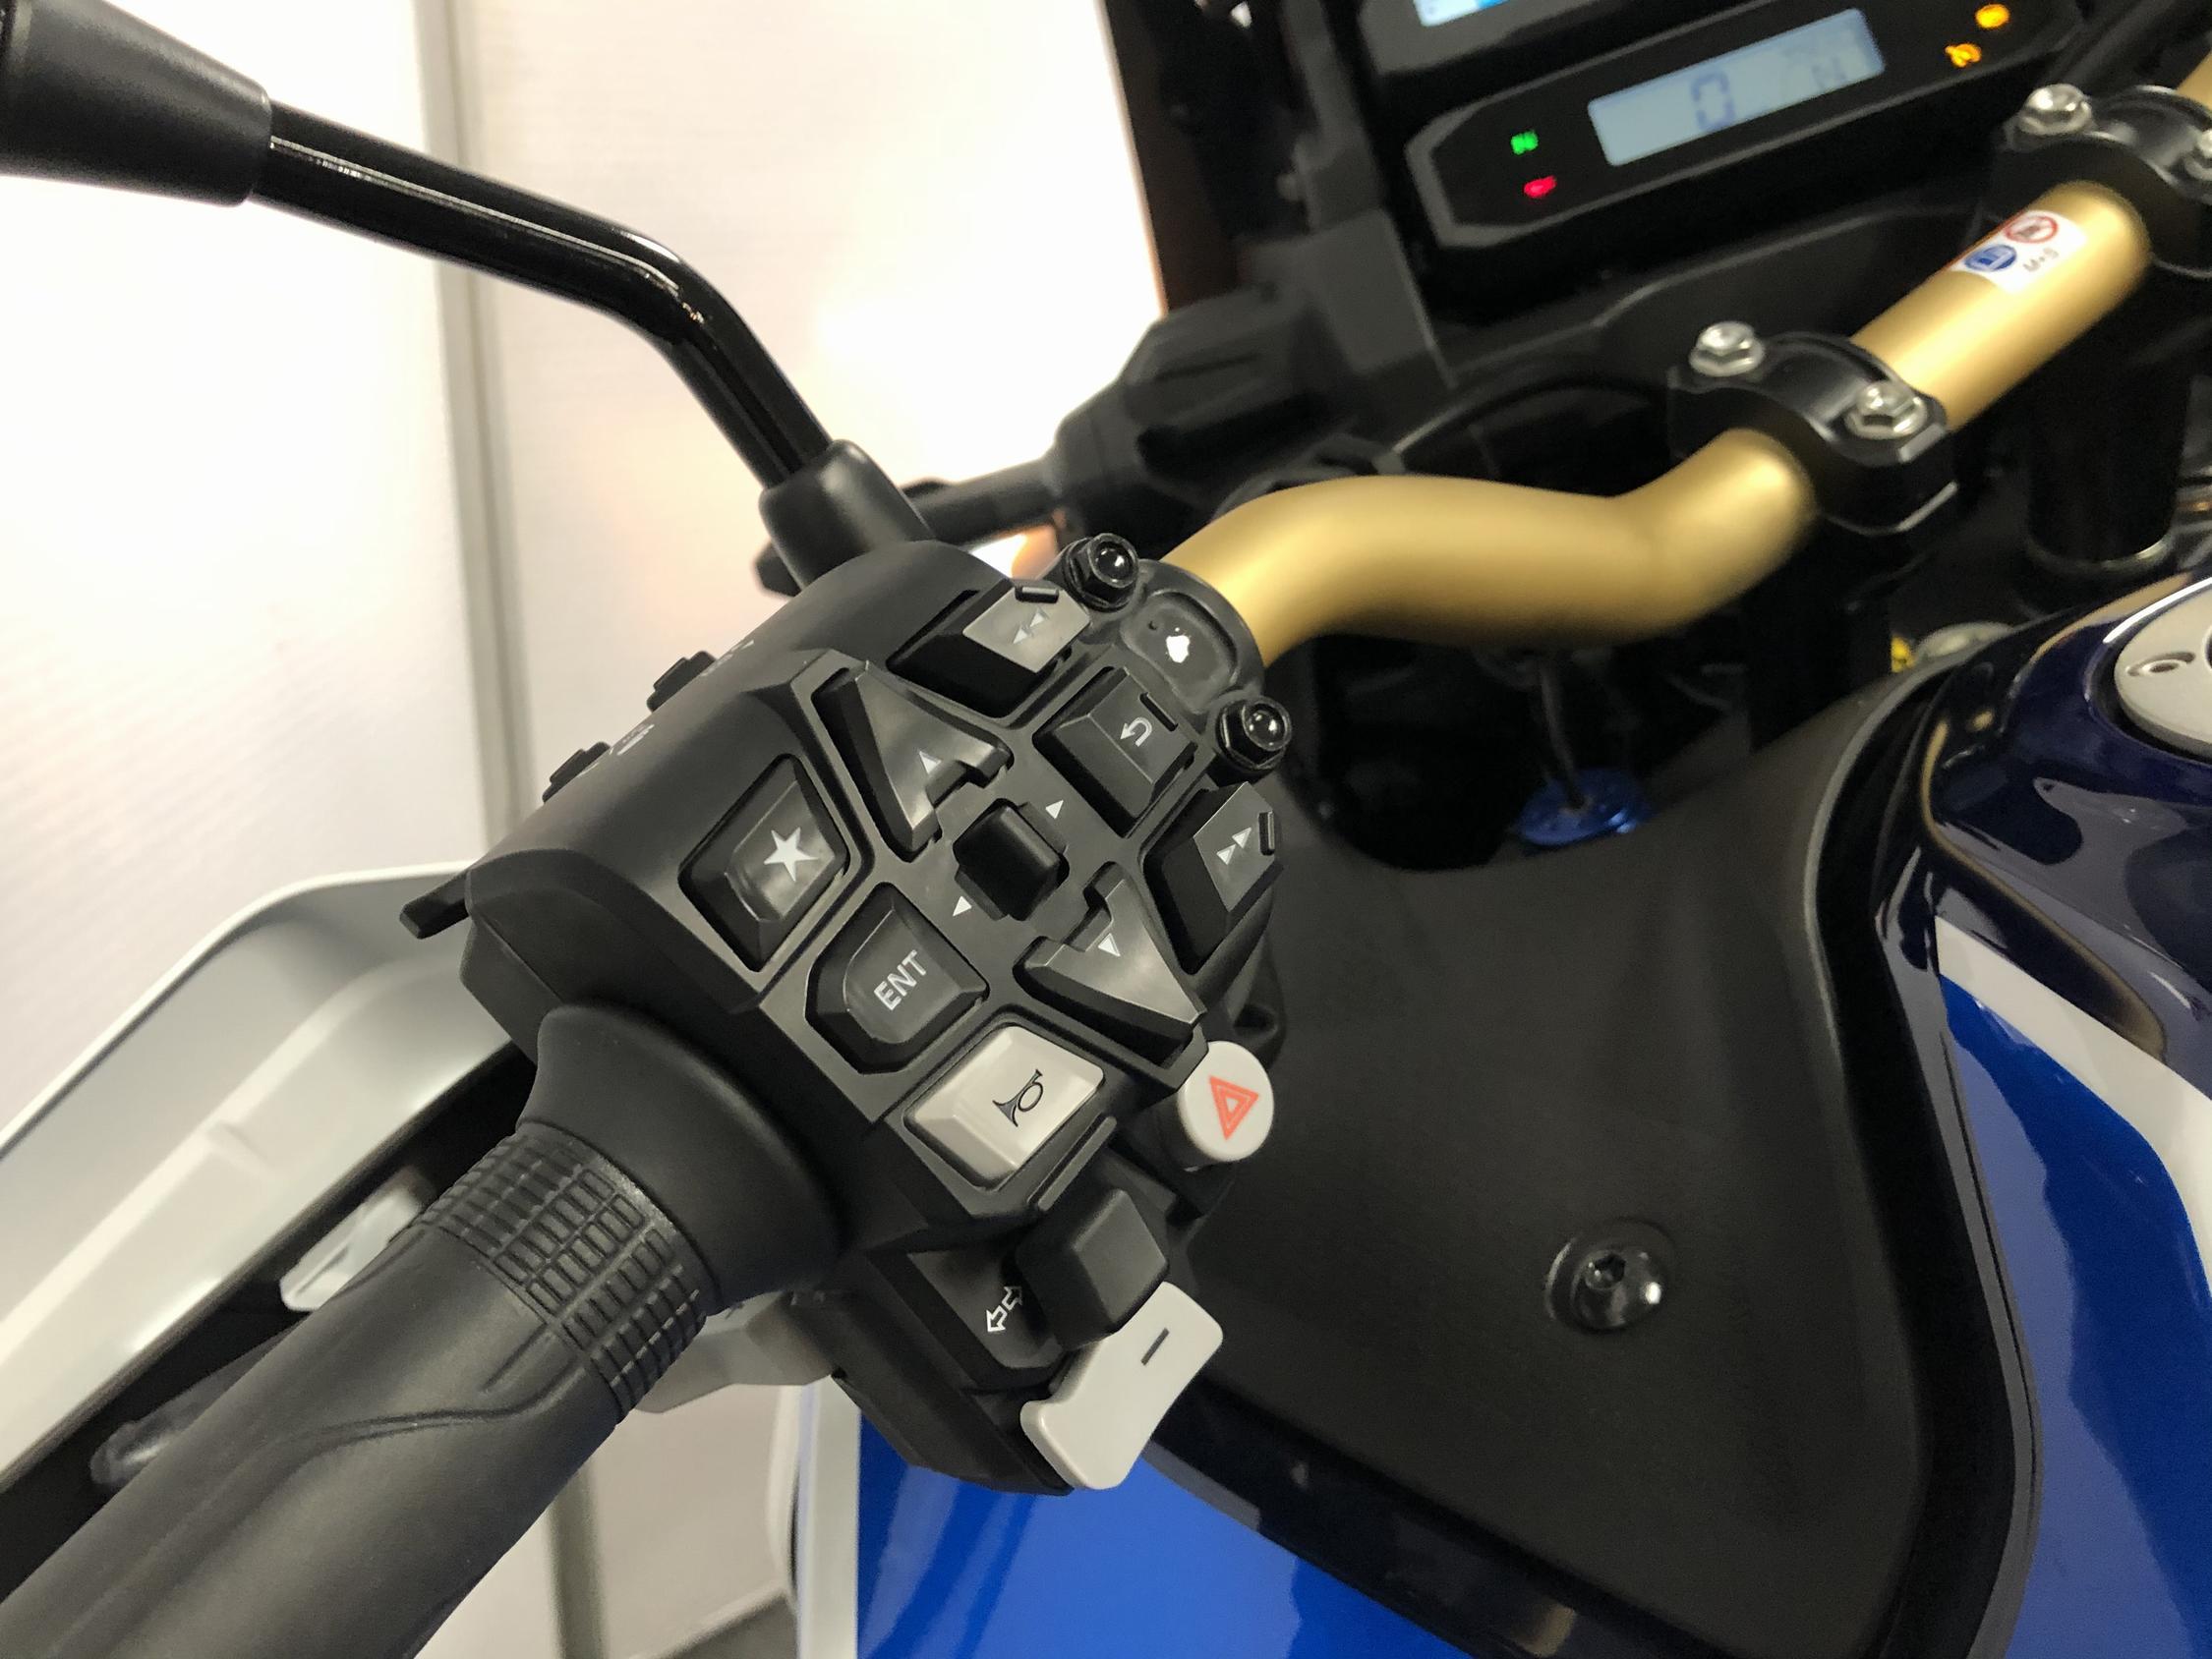 HONDA CRF 1100 ABS ADV SPORTS DCT